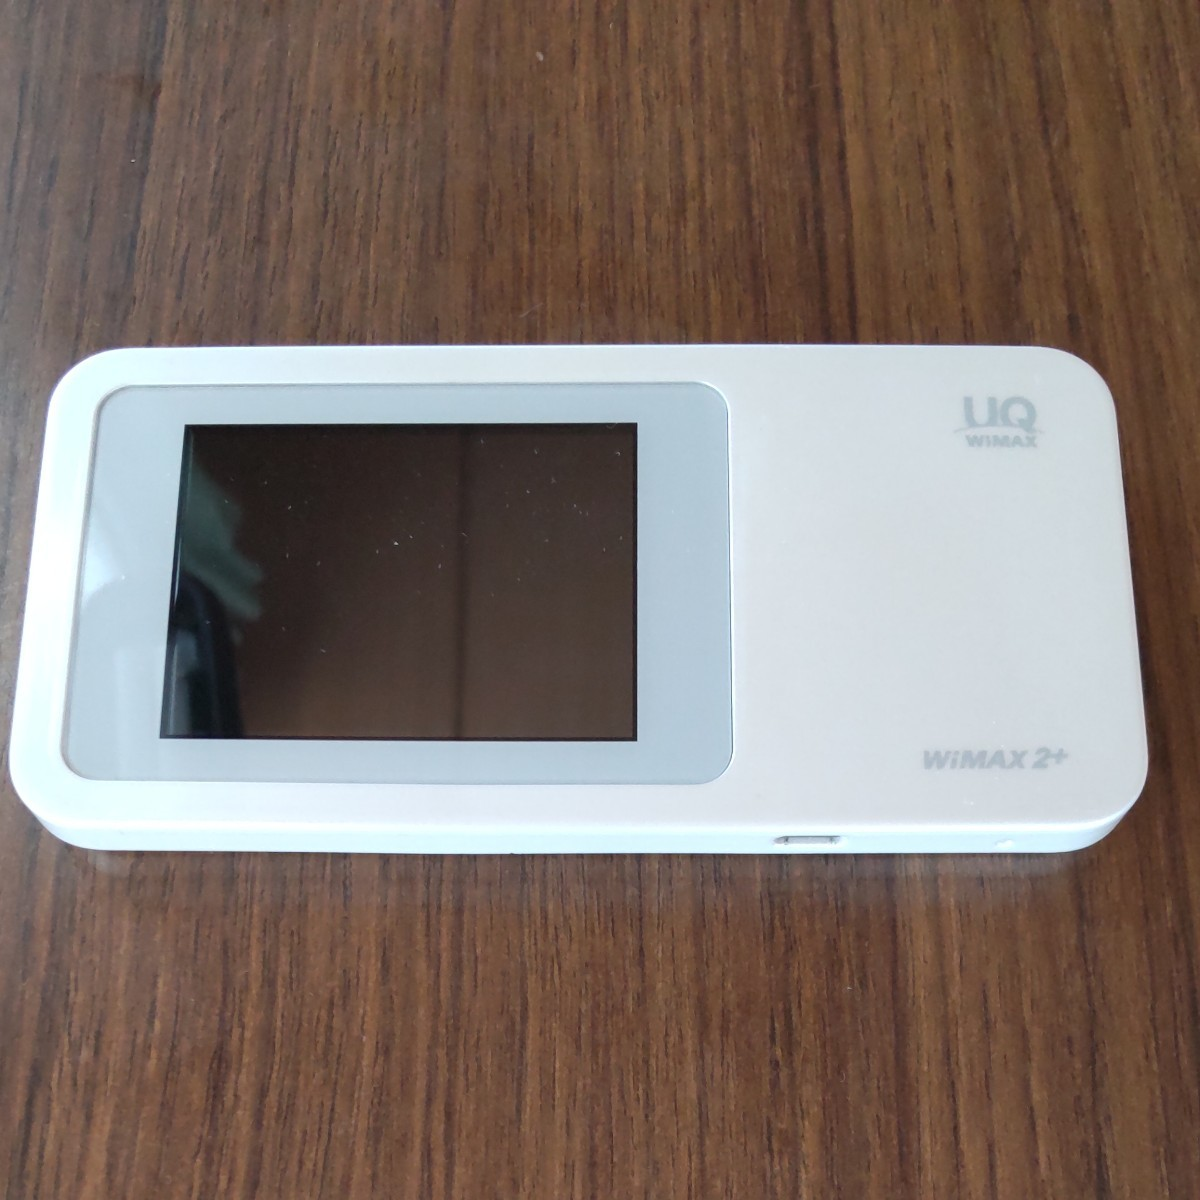 WiMAX2+ SPEED Wi-Fi NEXT W01 UQ